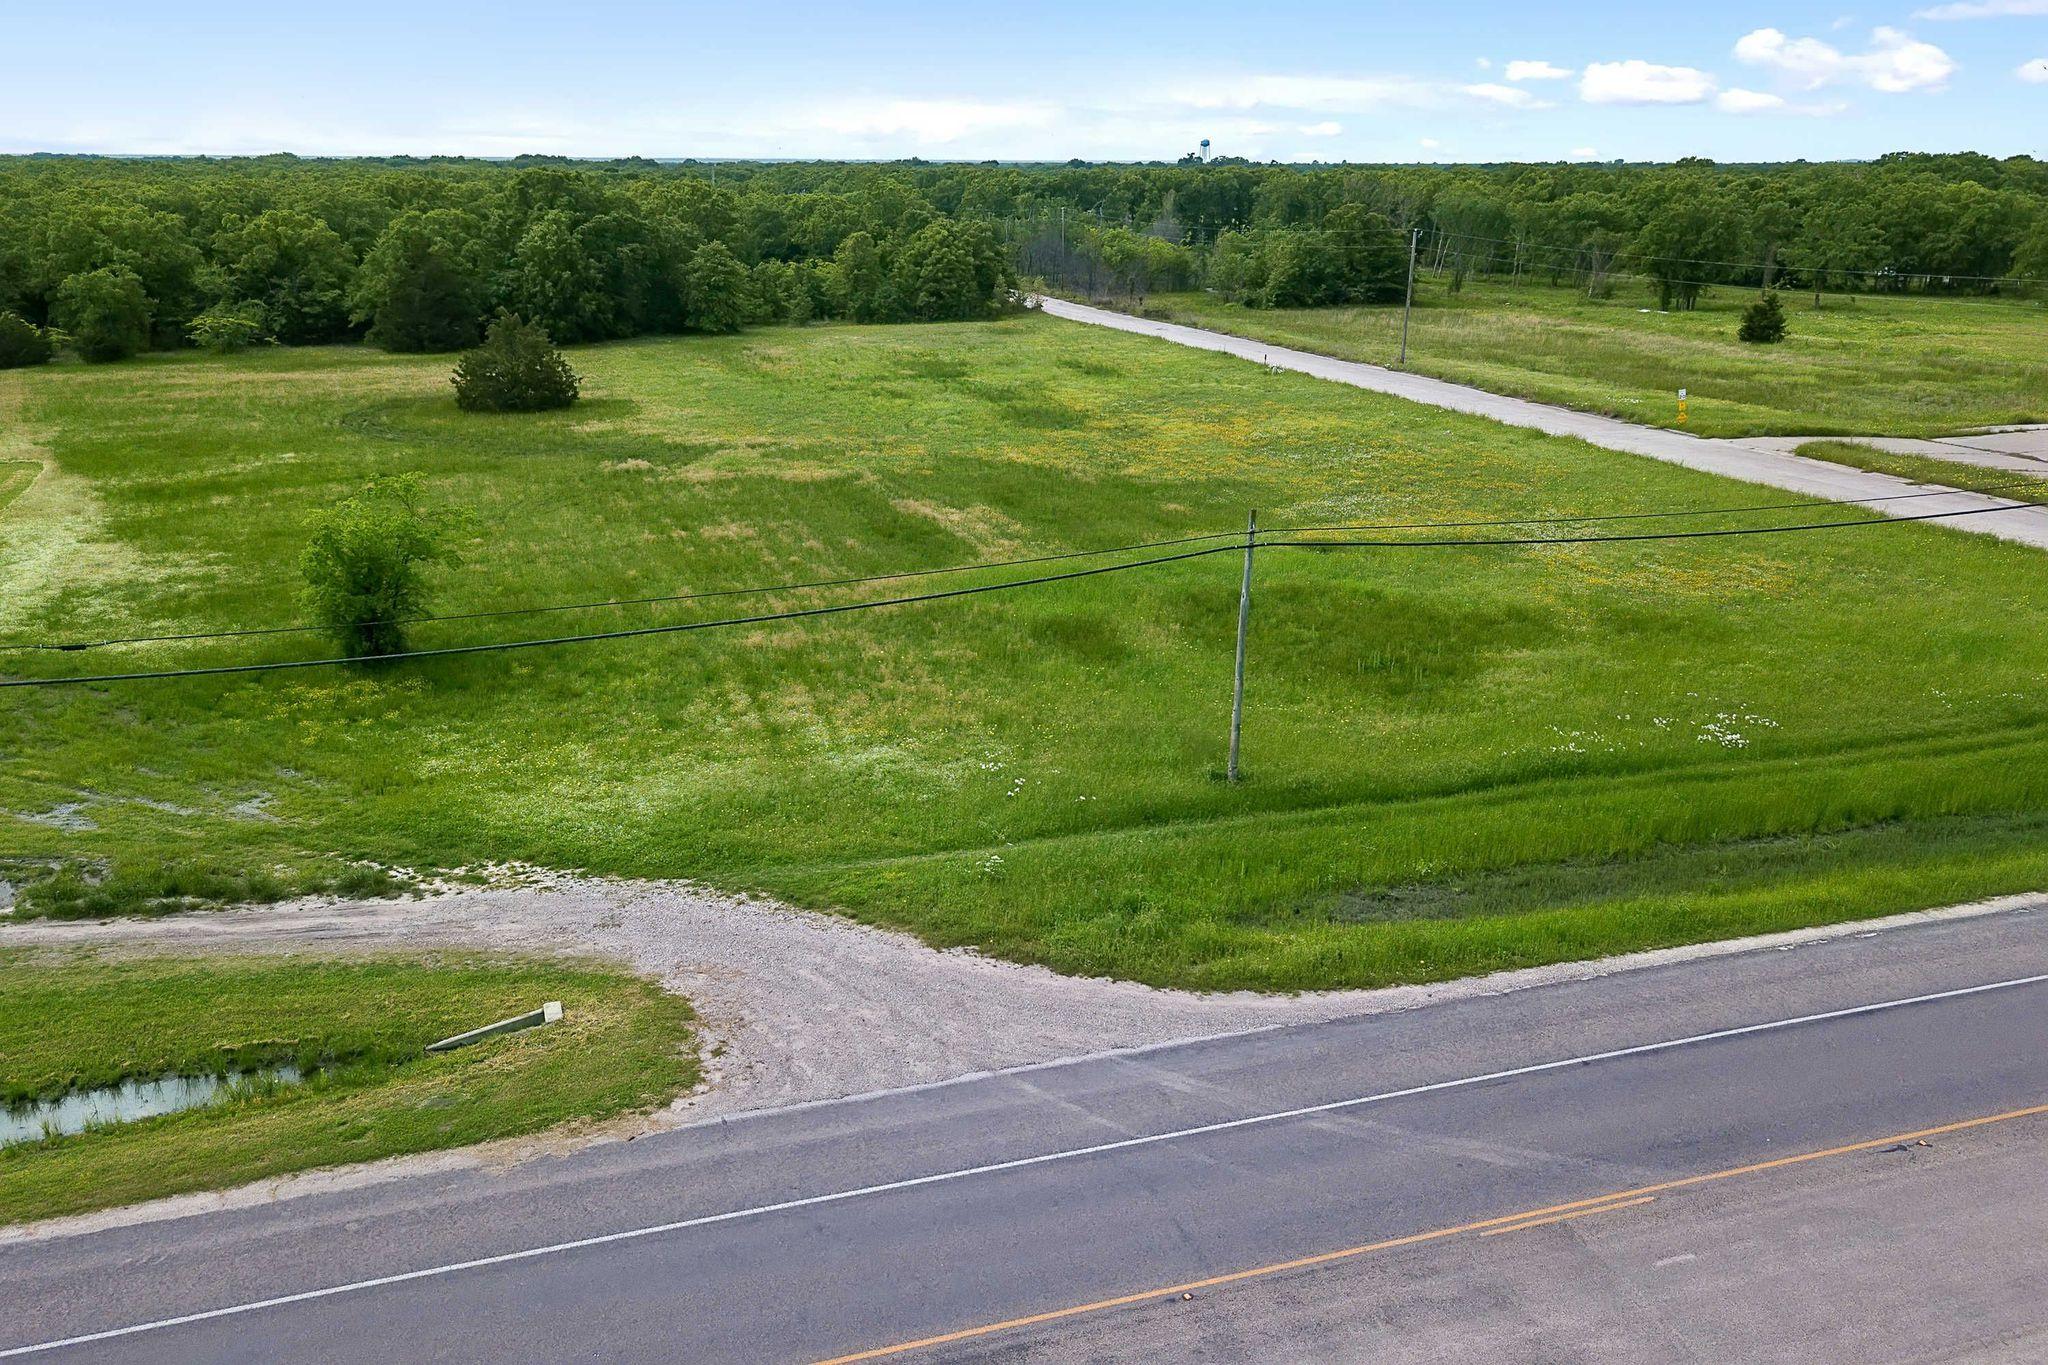 Highway 276, West Tawakoni, TX 75474 - Lot/Land - MLS# 14092557 - 8 Photos  | Trulia